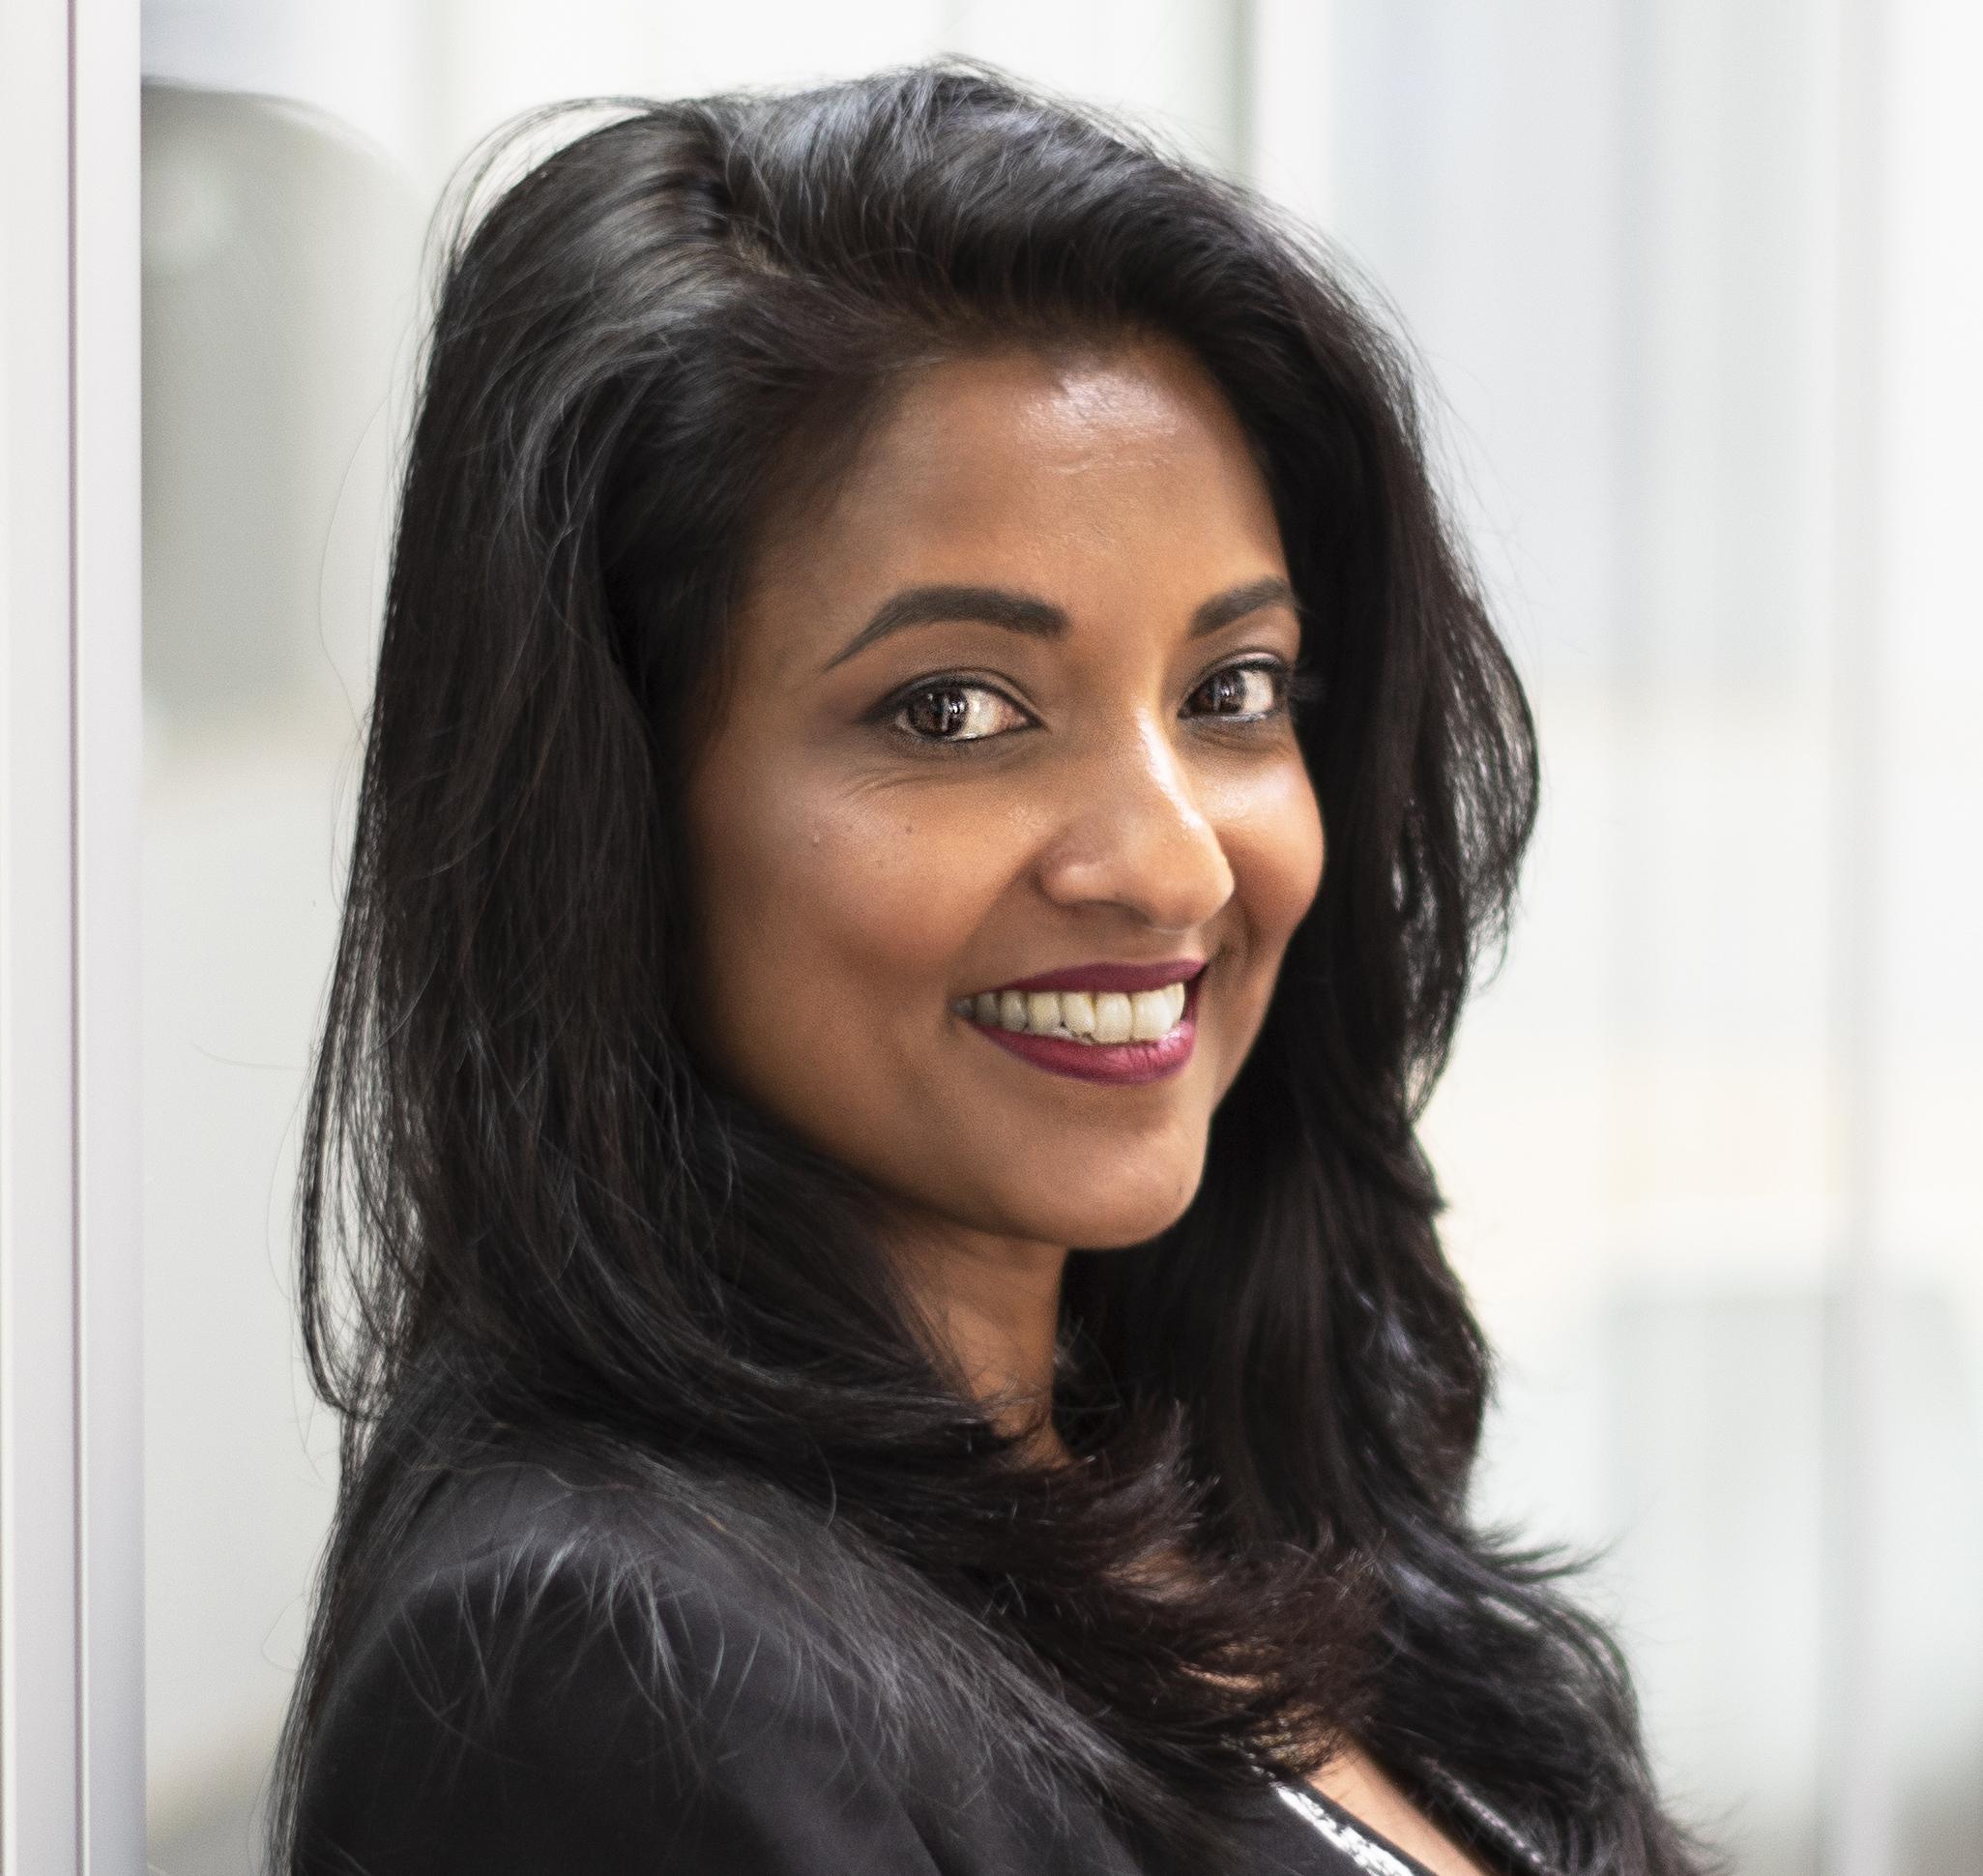 Supriya Dev-Purkaystha (She/Her)